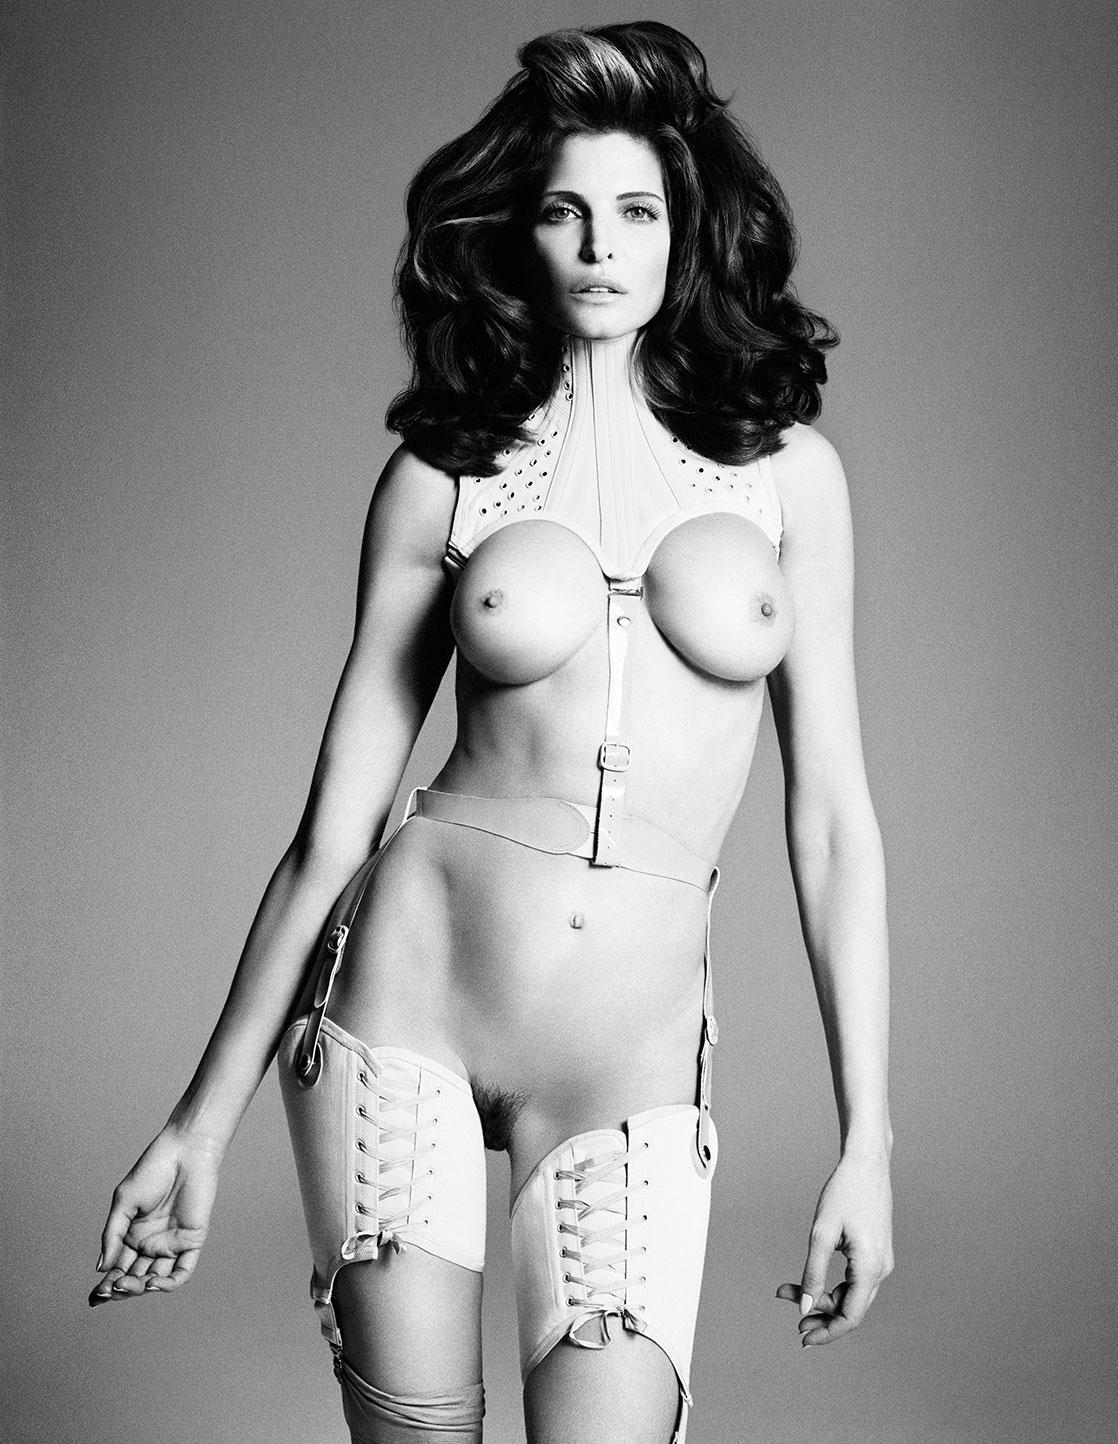 Stphanie Seymour nue , hot et sexy - Etats-Unis